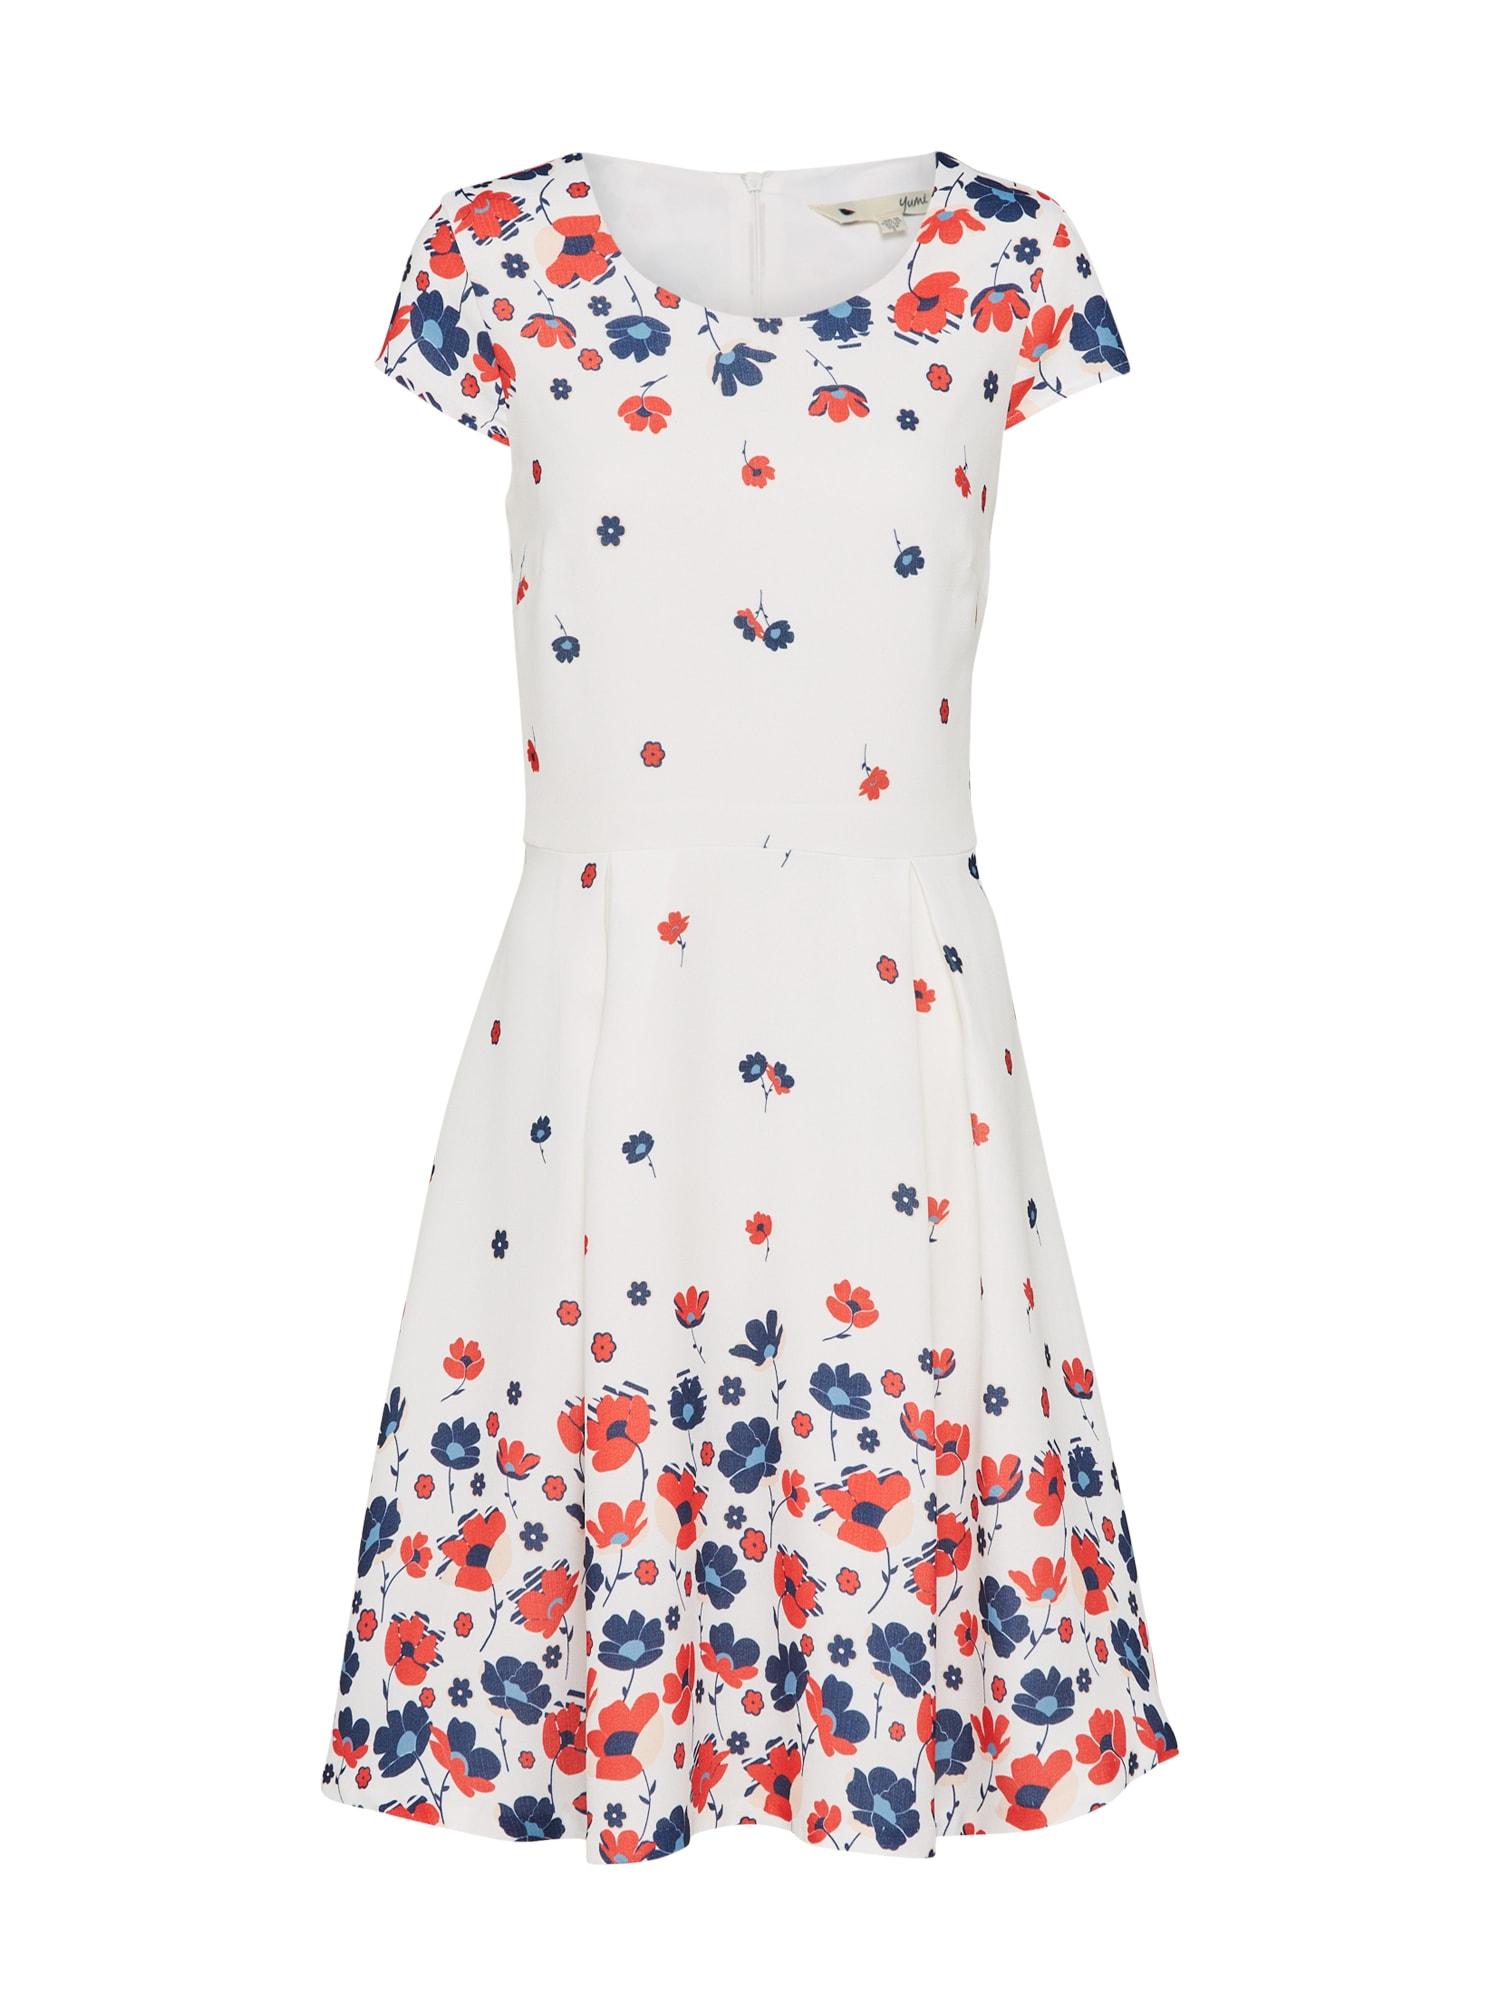 Šaty FLORAL modrá červená bílá Yumi